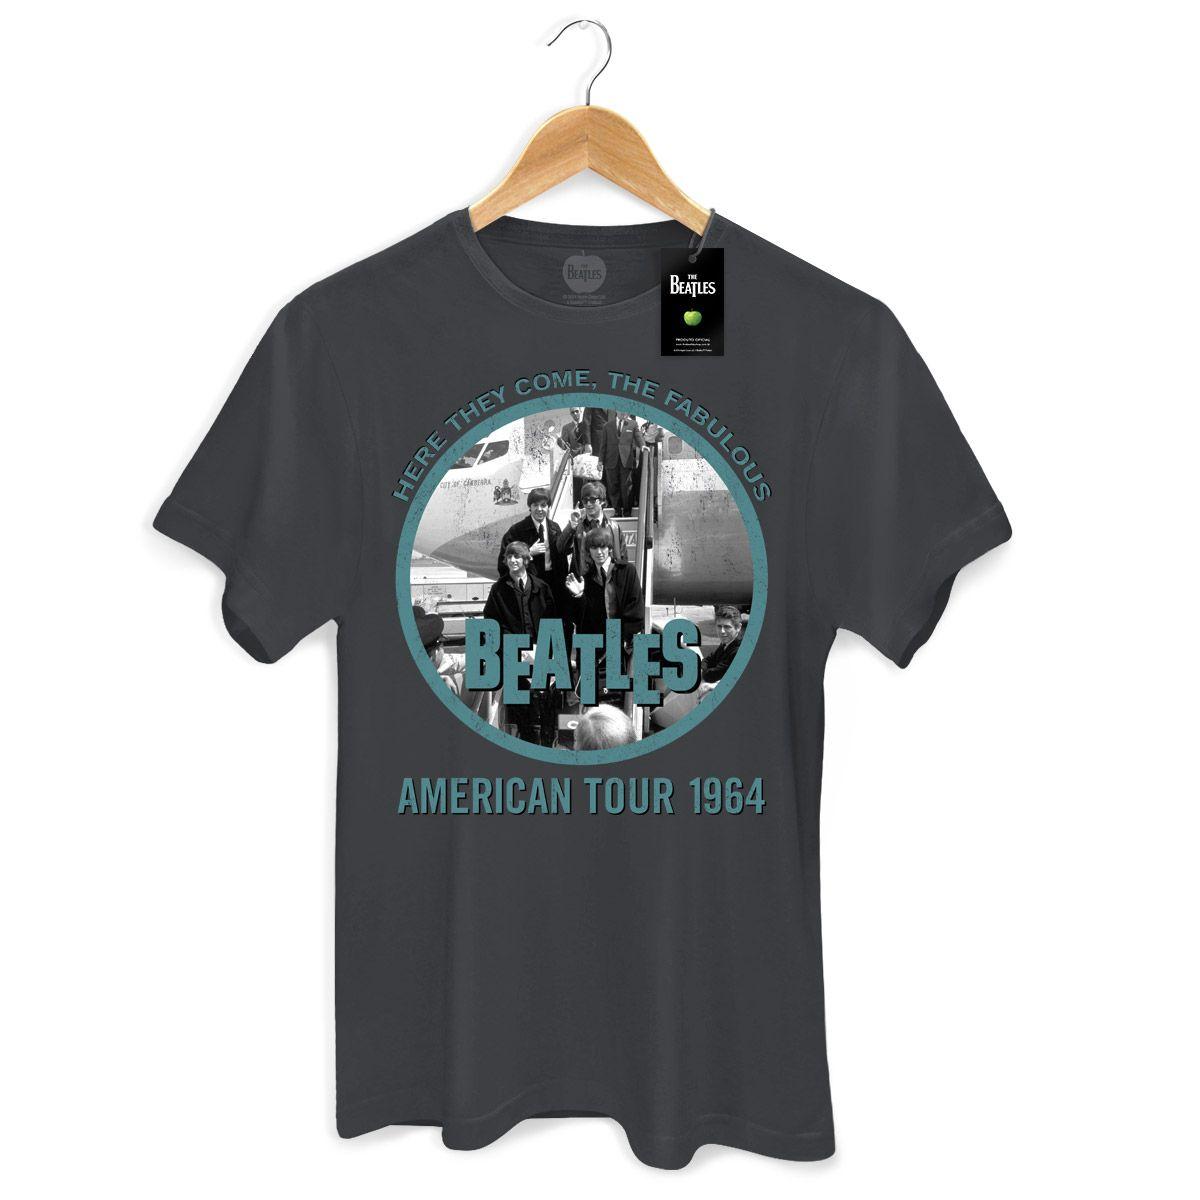 Camiseta Masculina The Beatles Fabulous American Tour 1964